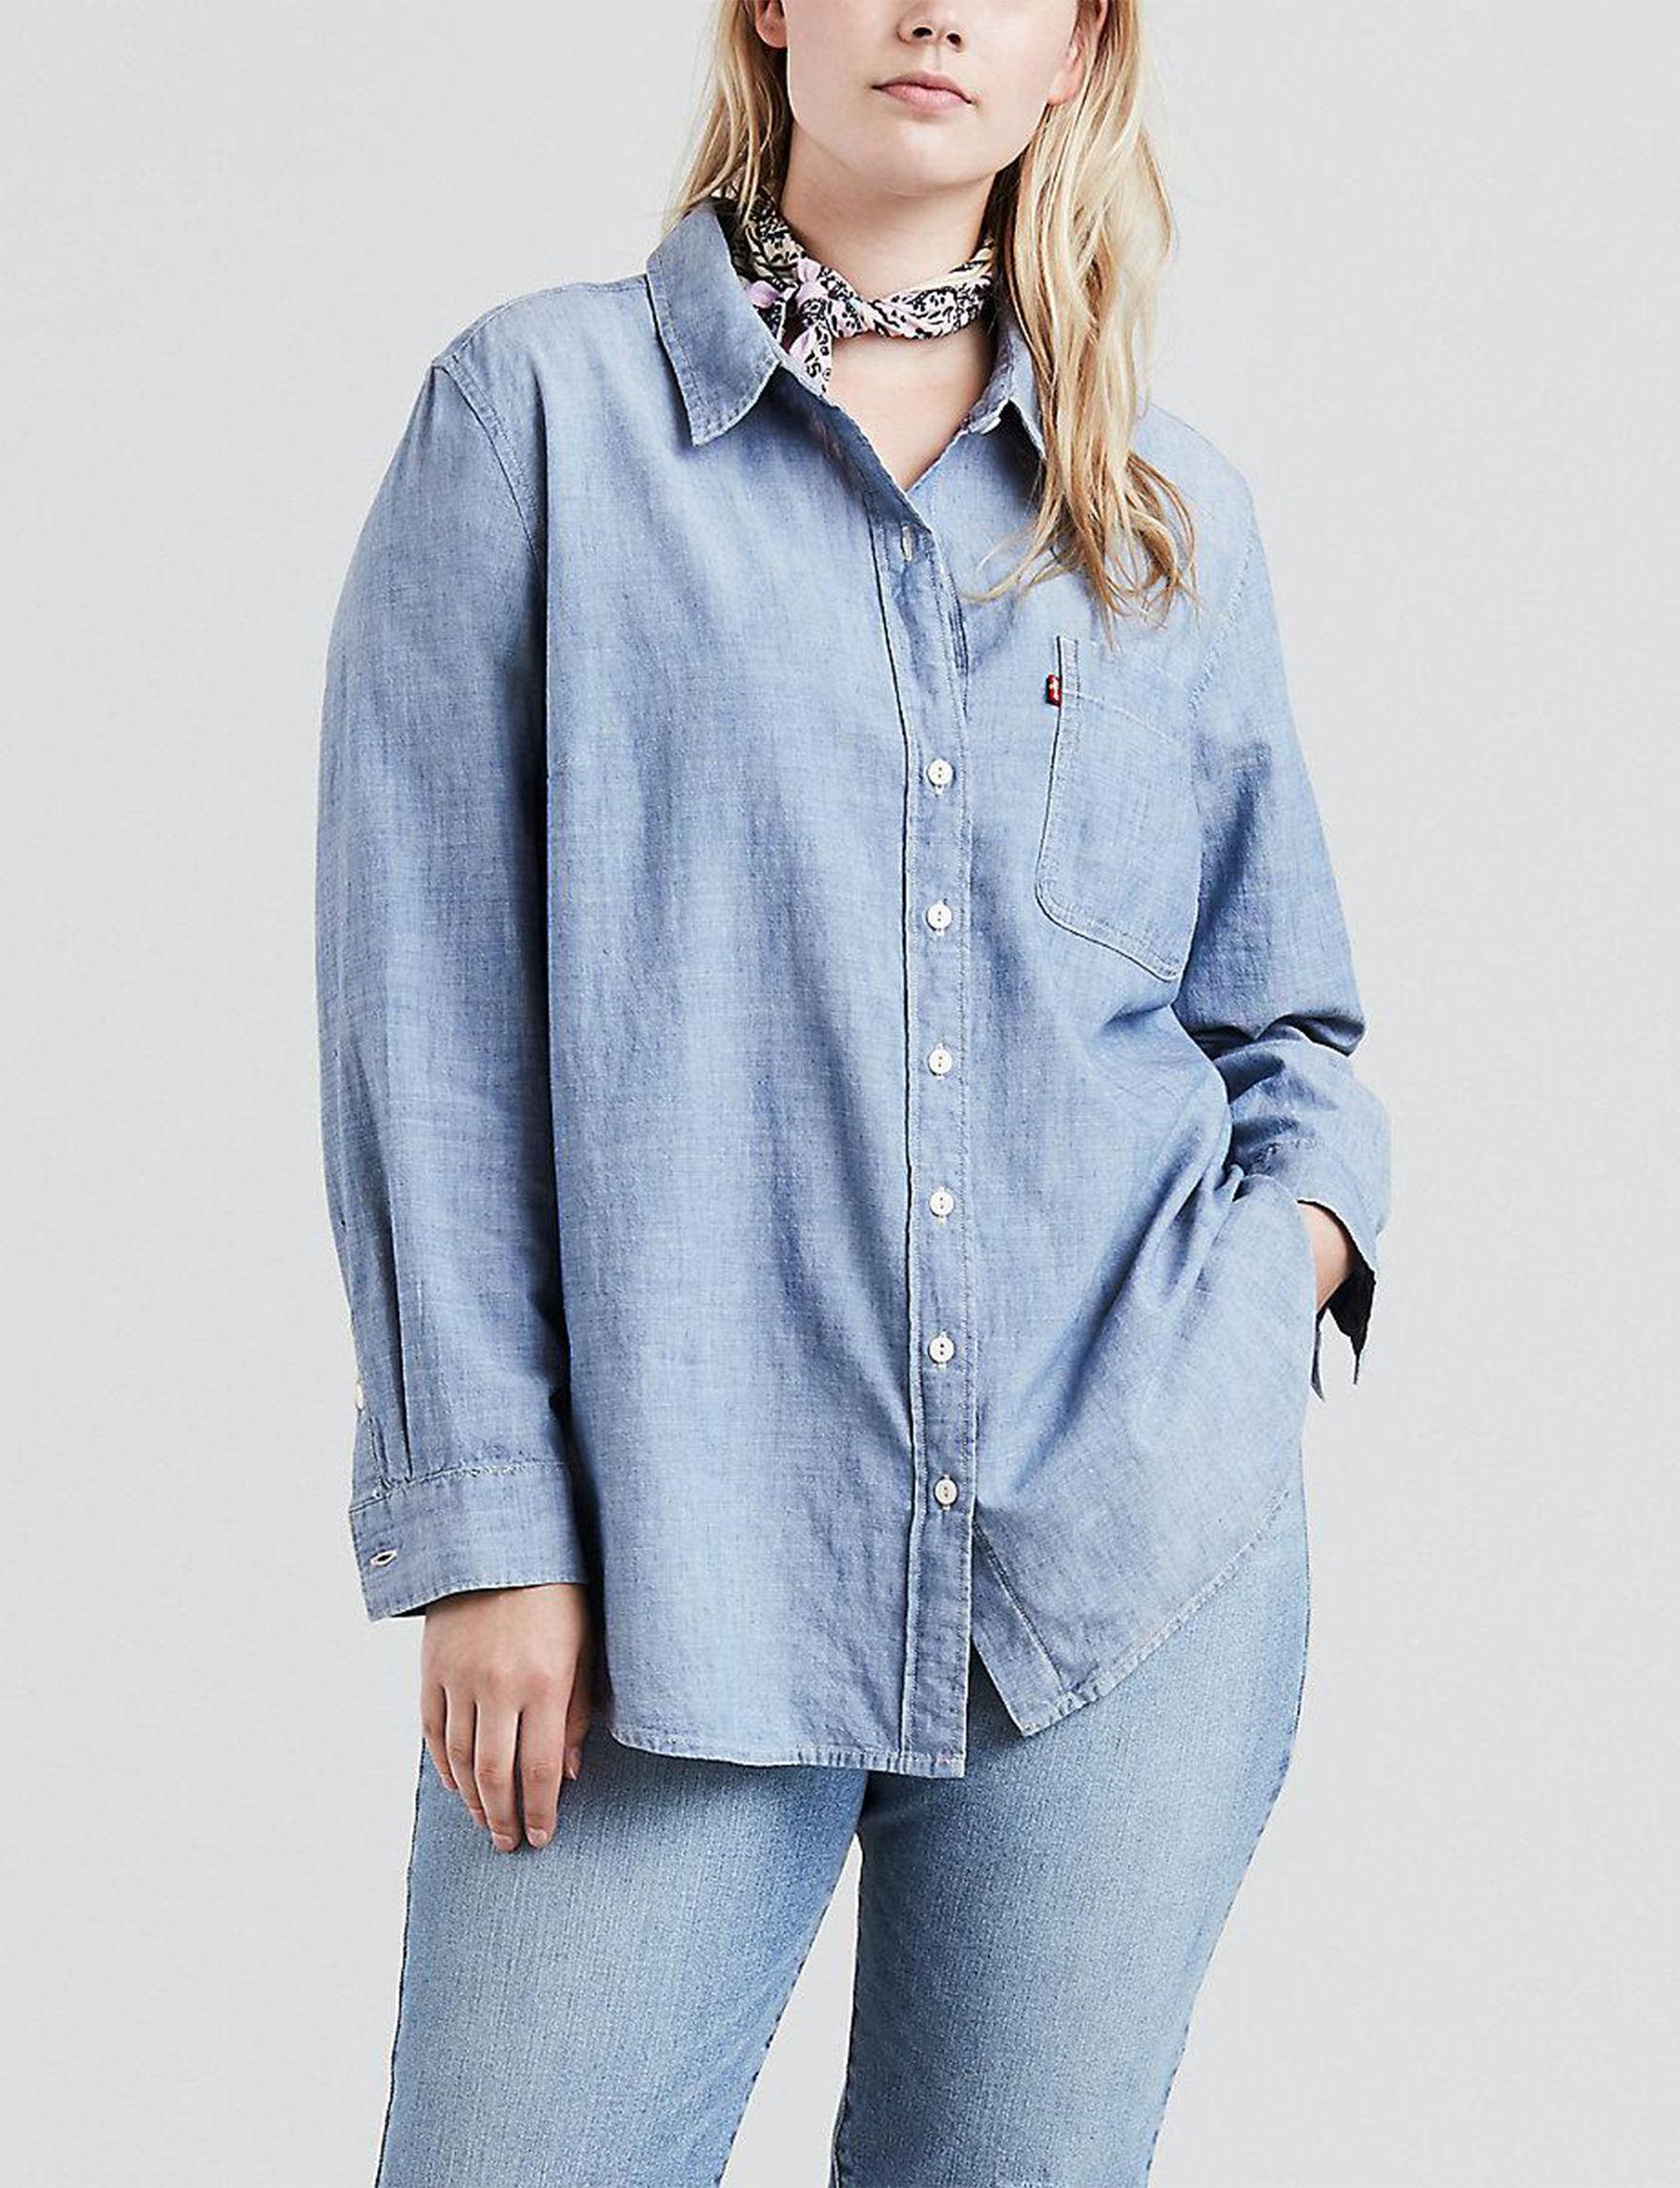 Levi's Blue Shirts & Blouses